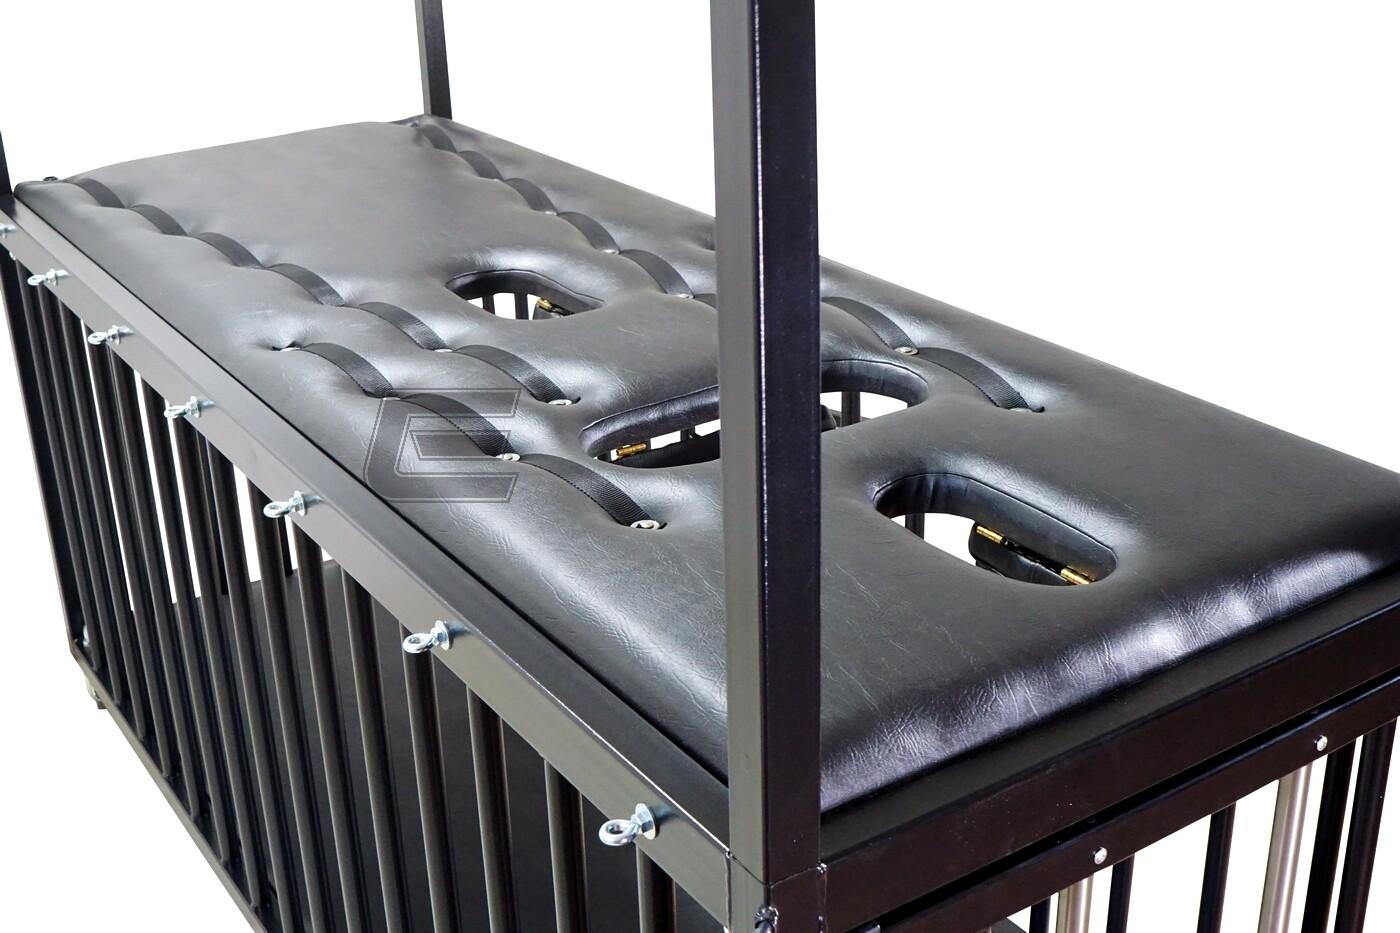 EvilToys - BDSM Bondage Käfig mit aufsetzbarem Bondage-Rahmen